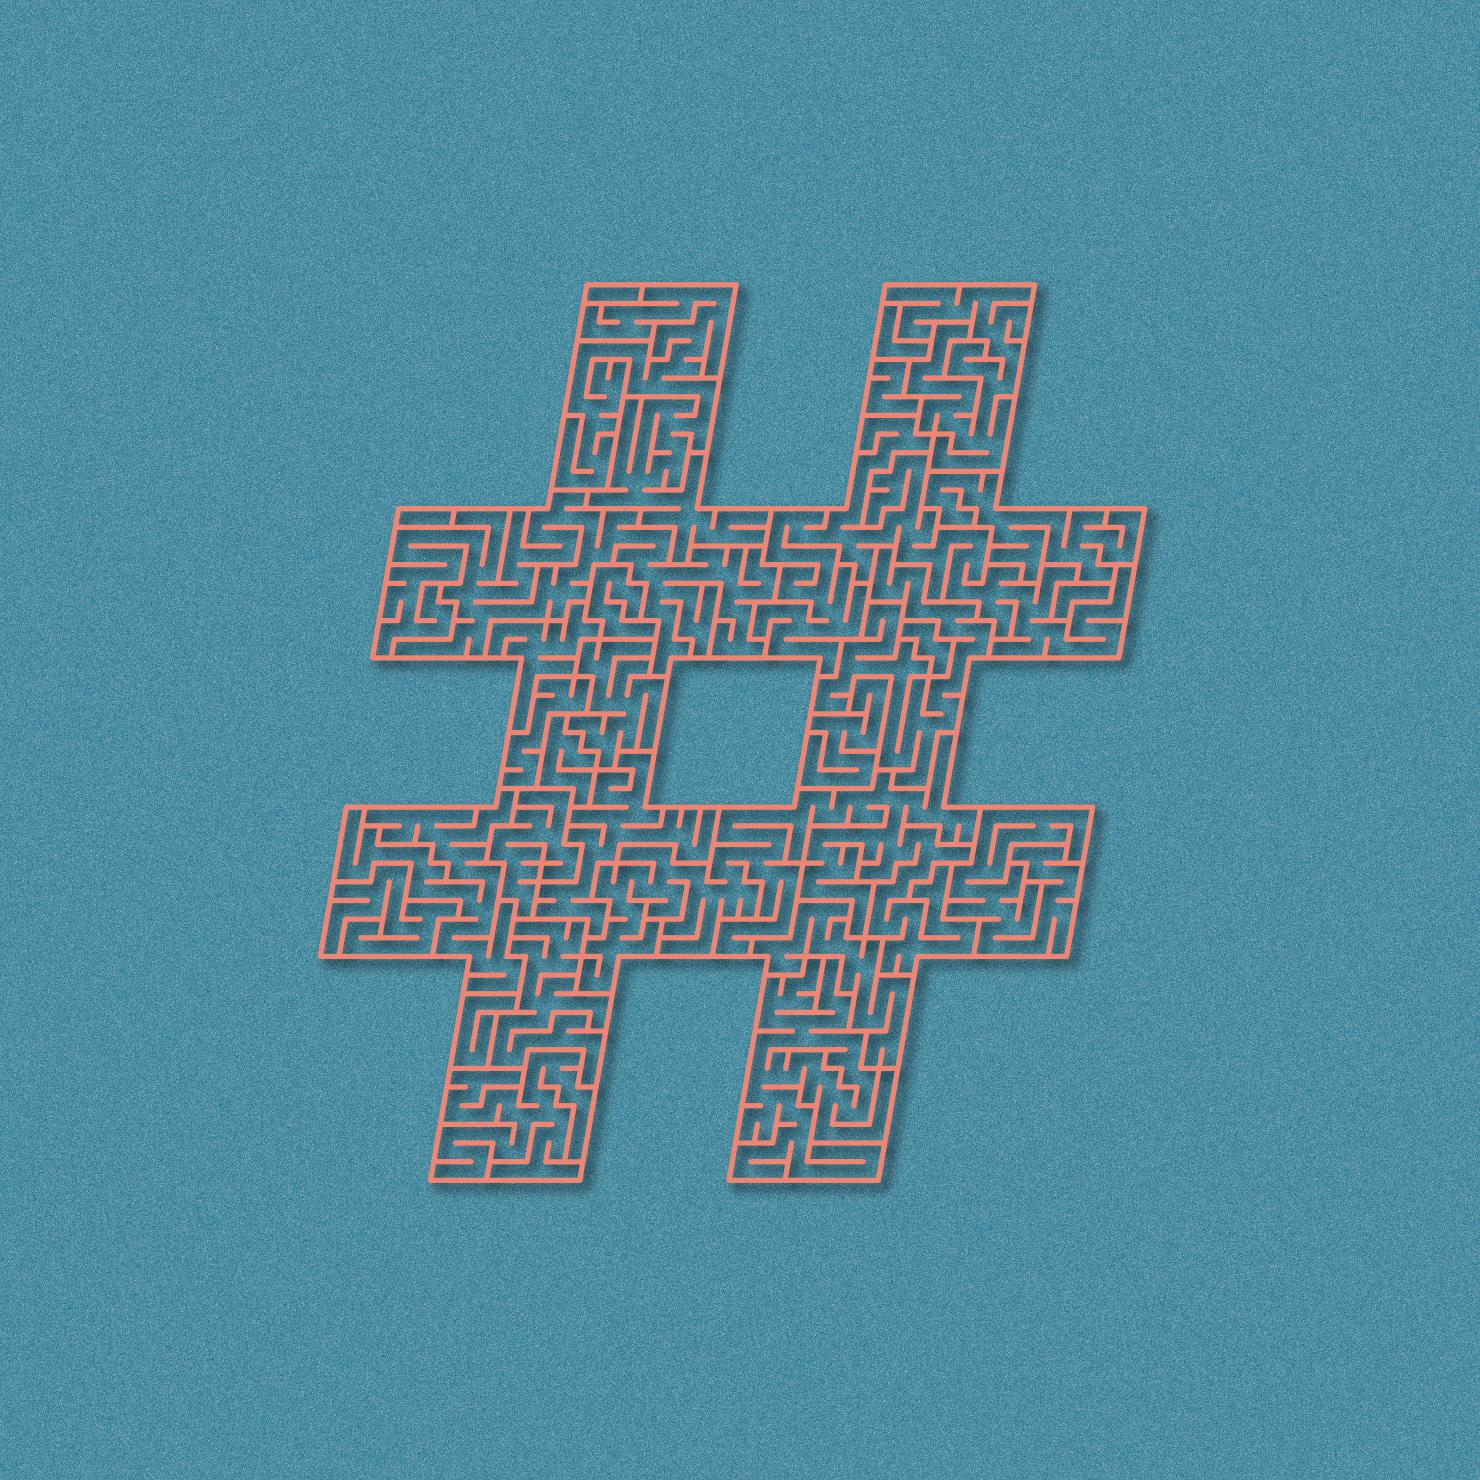 ATC Artist Series Pablo Tradacete Letter Symbols